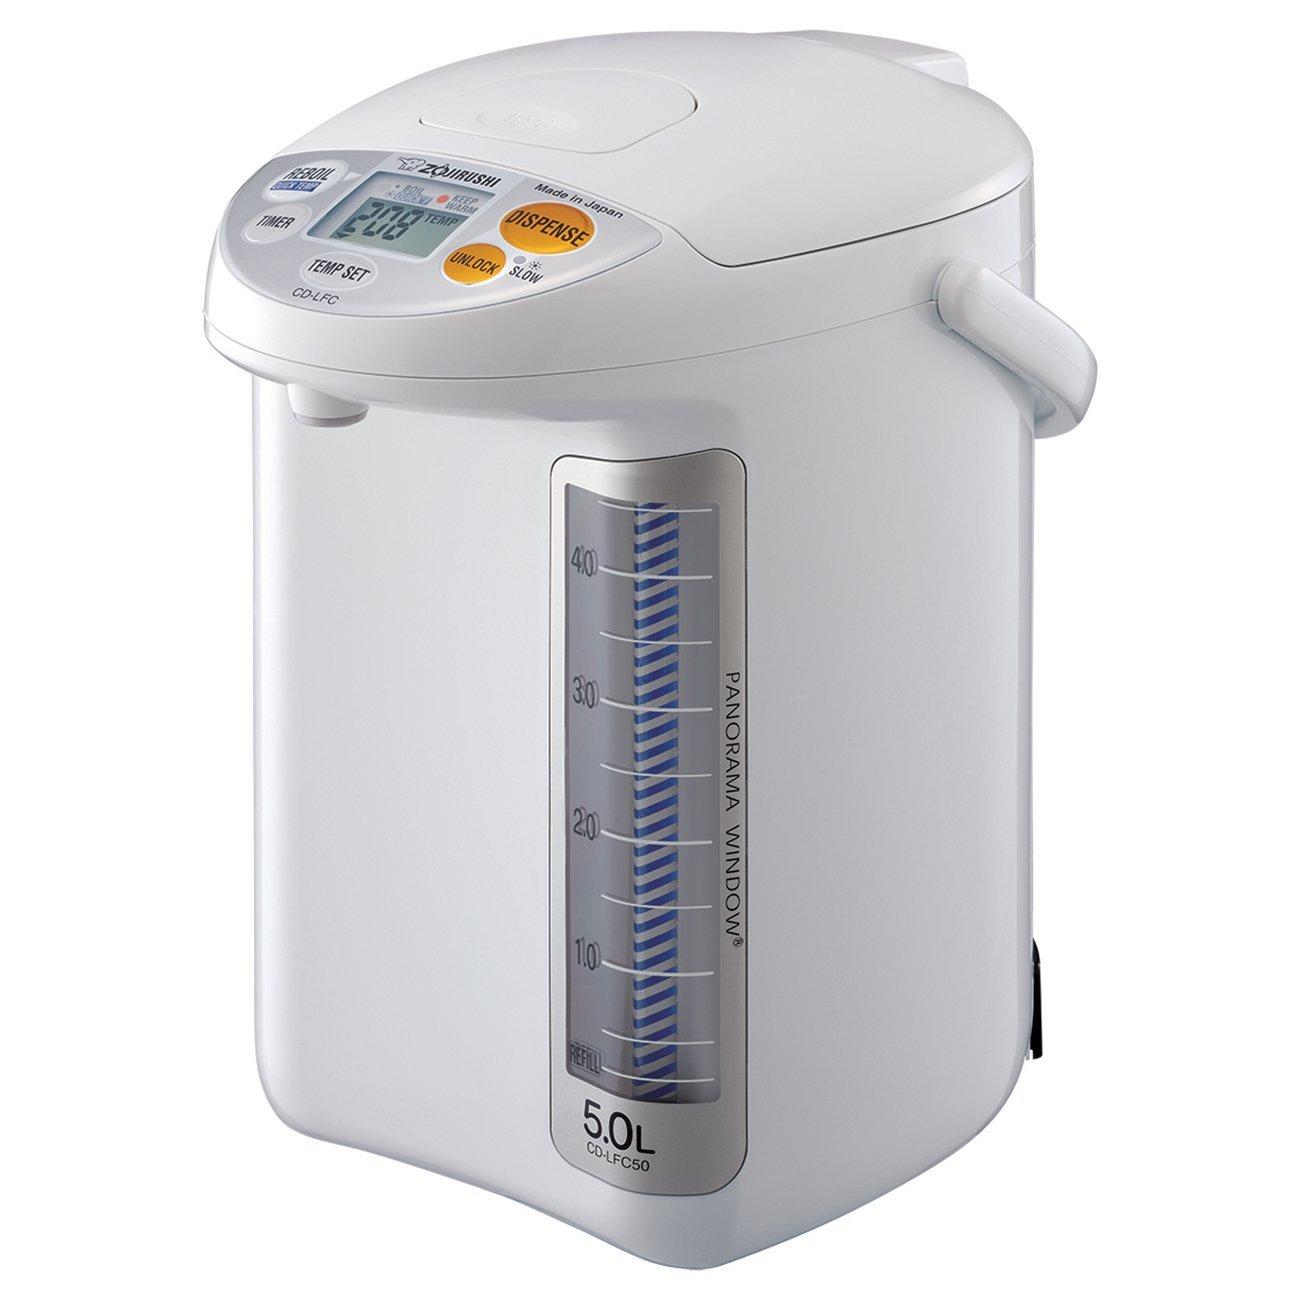 Zojirushi CD-LFC50 Panorama Window Micom Water Boiler and Warmer, 169 oz/5.0 L, White (Renewed)